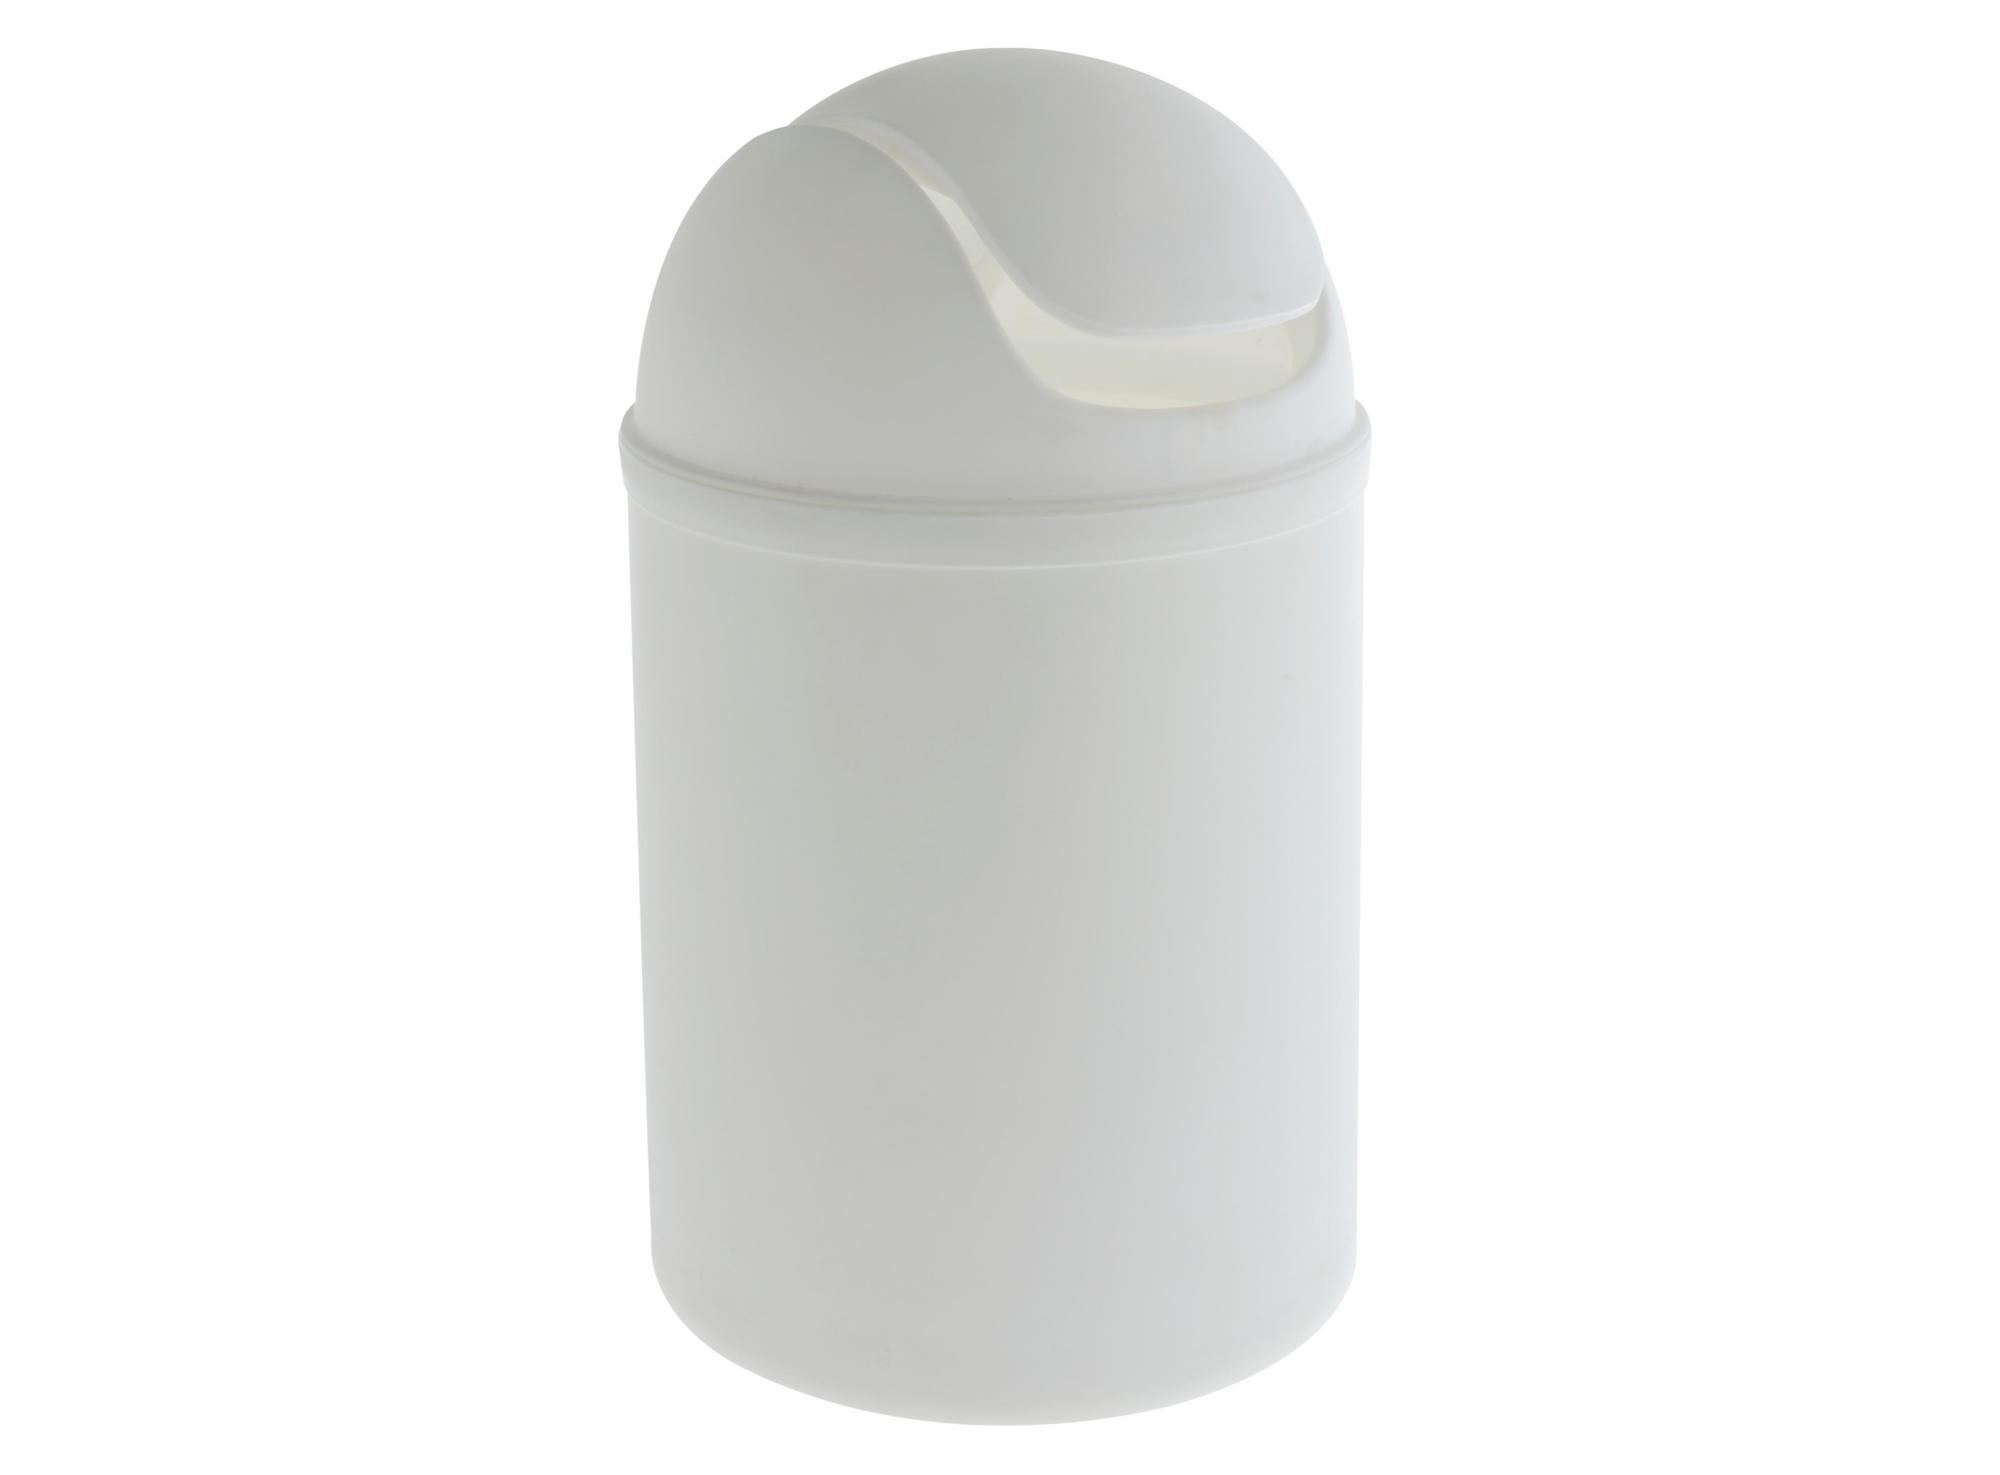 Poubelle couvercle a bascule en polypropylene teinte coloris blanc co ...